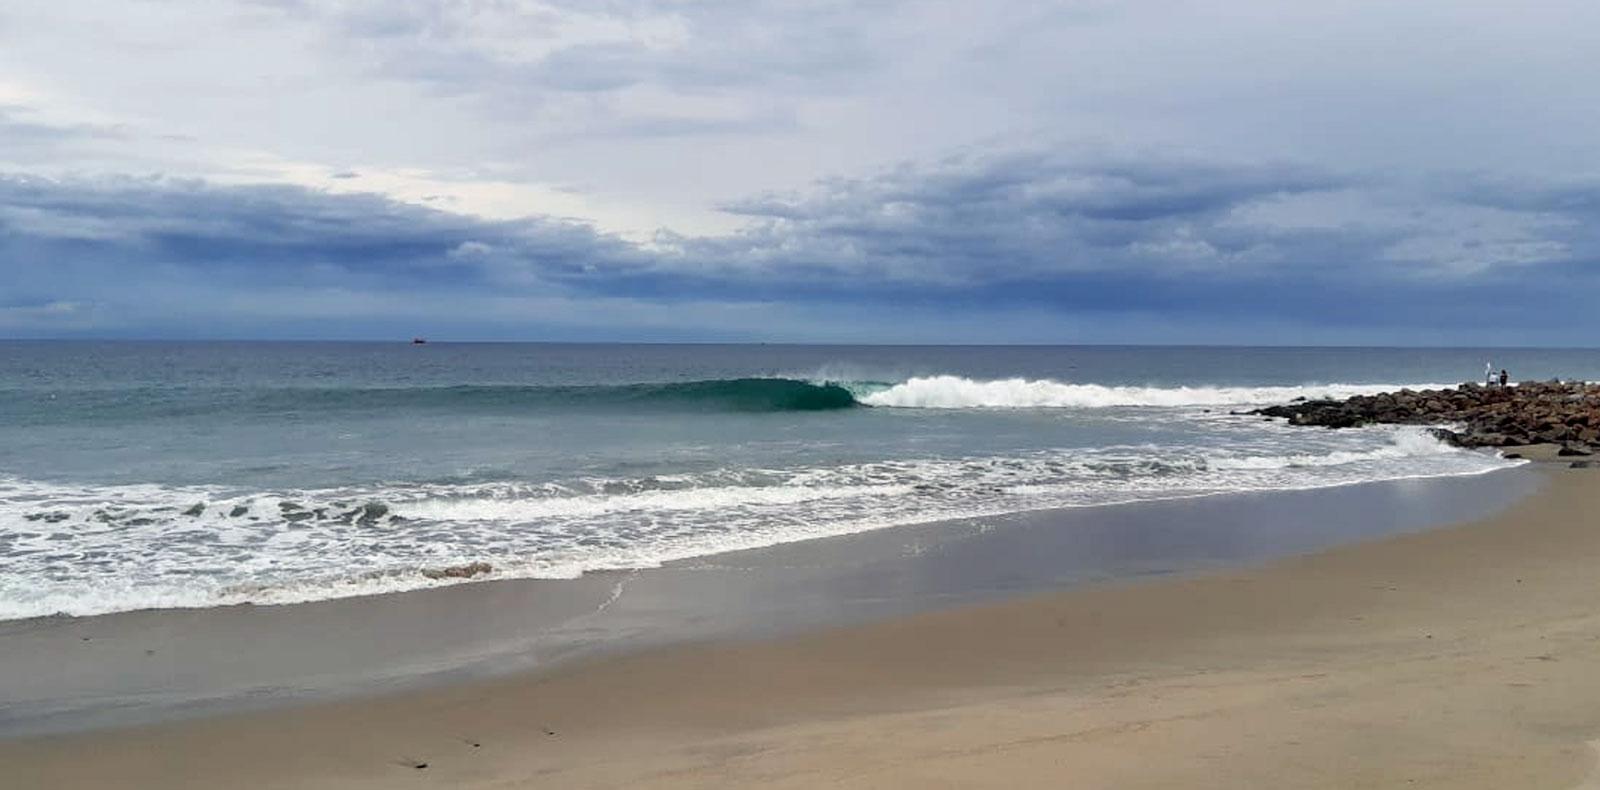 surfing under stormy skies in salina cruz, oaxaca, mexico, las palmeras surf camp